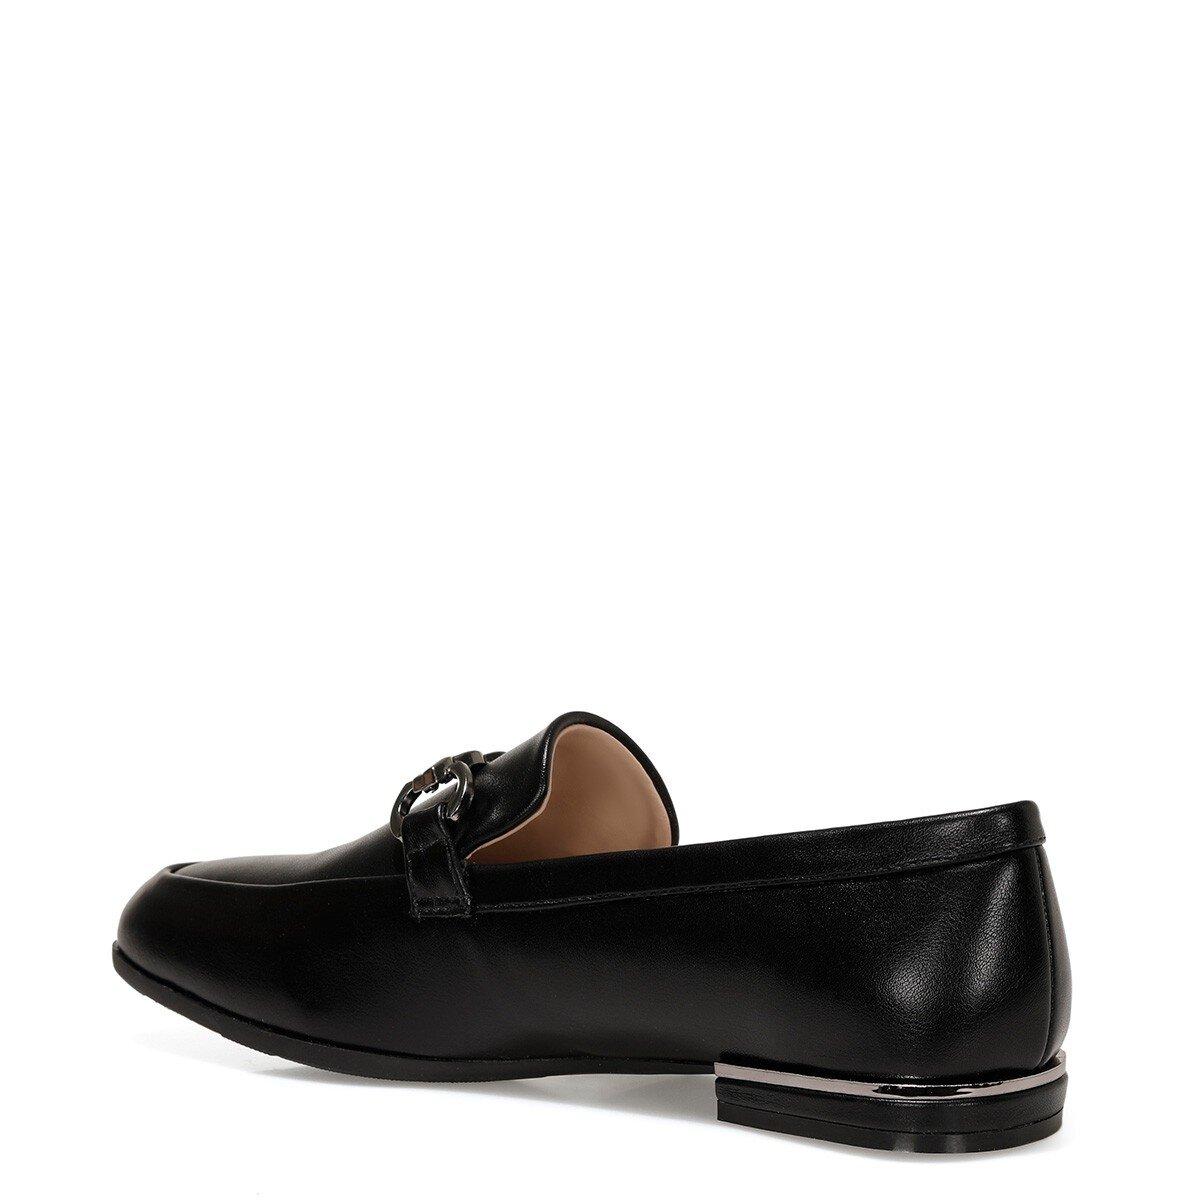 ROMAH 1FX Siyah Kadın Loafer